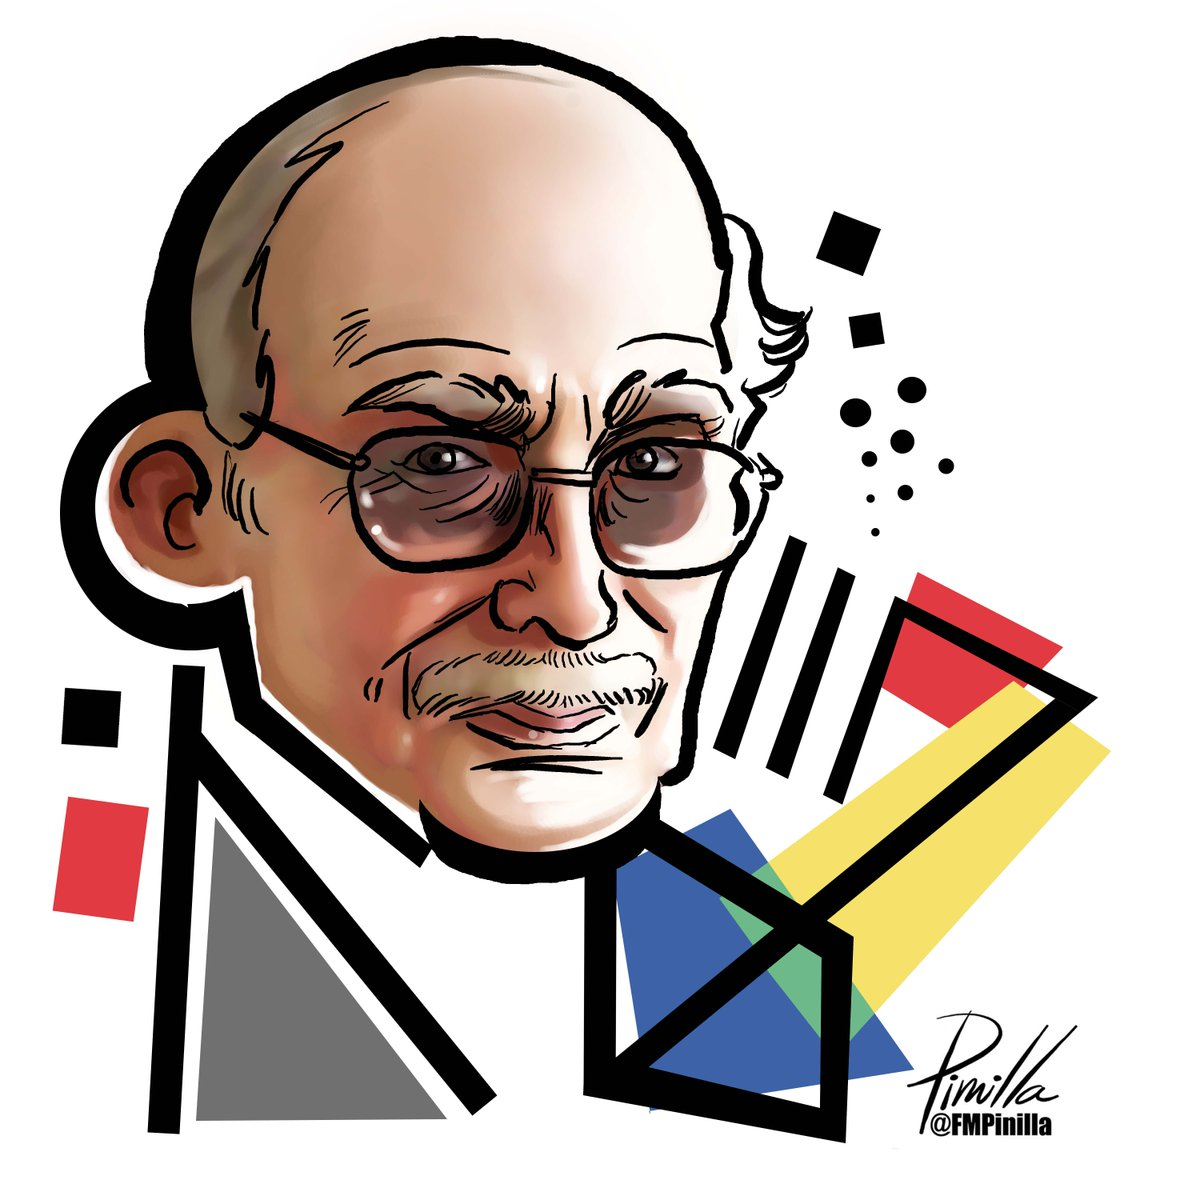 Maravilla de caricatura de @FMPinilla pa...